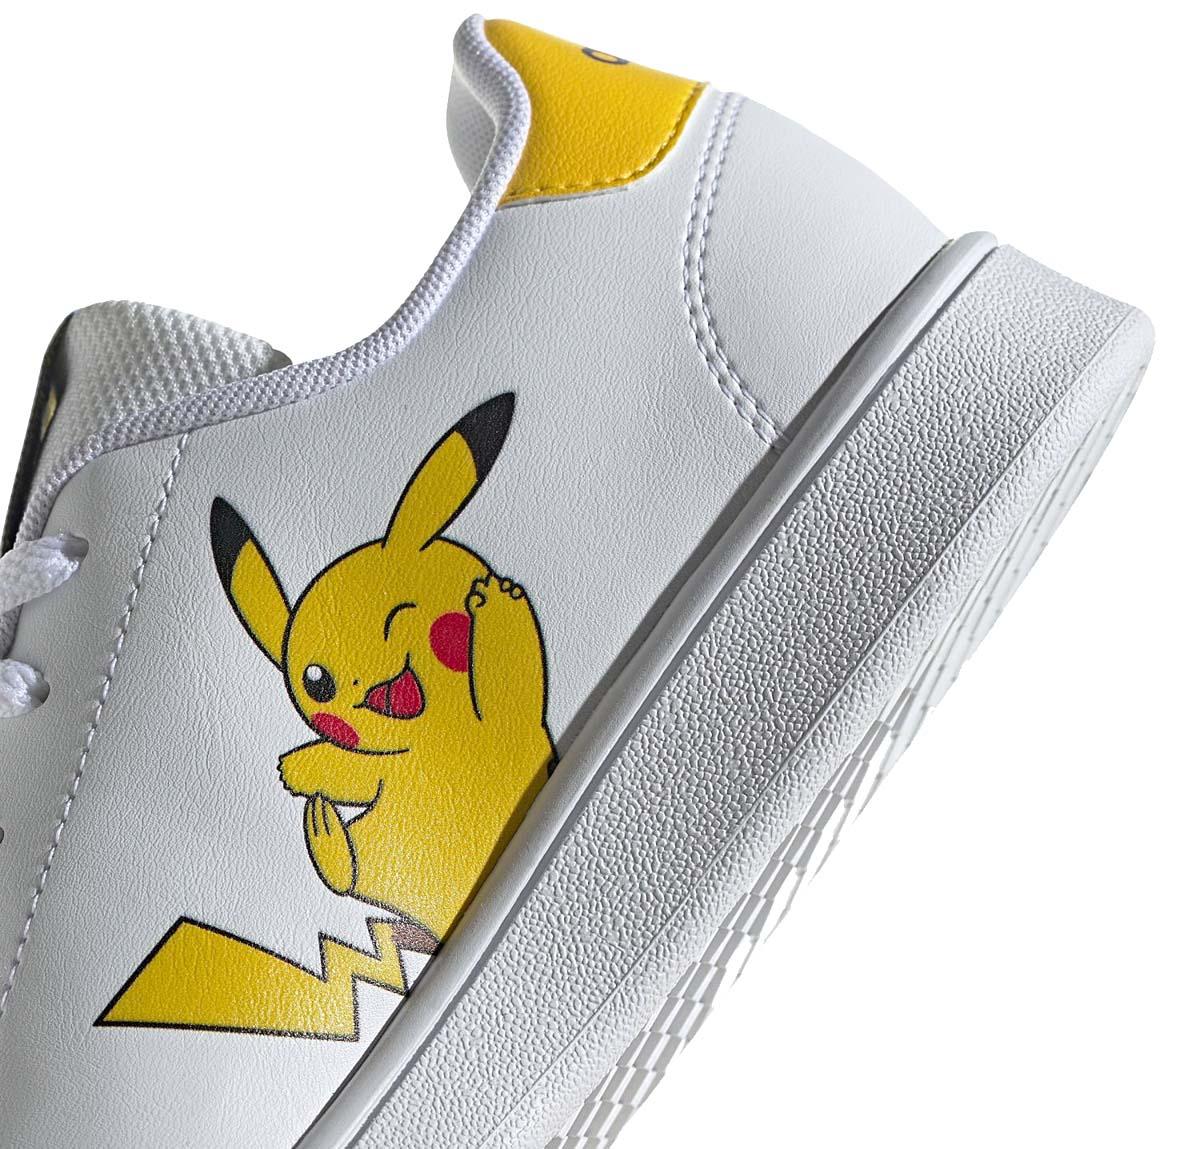 adidas ADVANTAGE  Pokémon Pikachu CLOUD WHITE / EQT YELLOW / CLOUD WHITE FW3187 アディダス アドバンテージ ポケモン ピカチュー ホワイト/イエロー